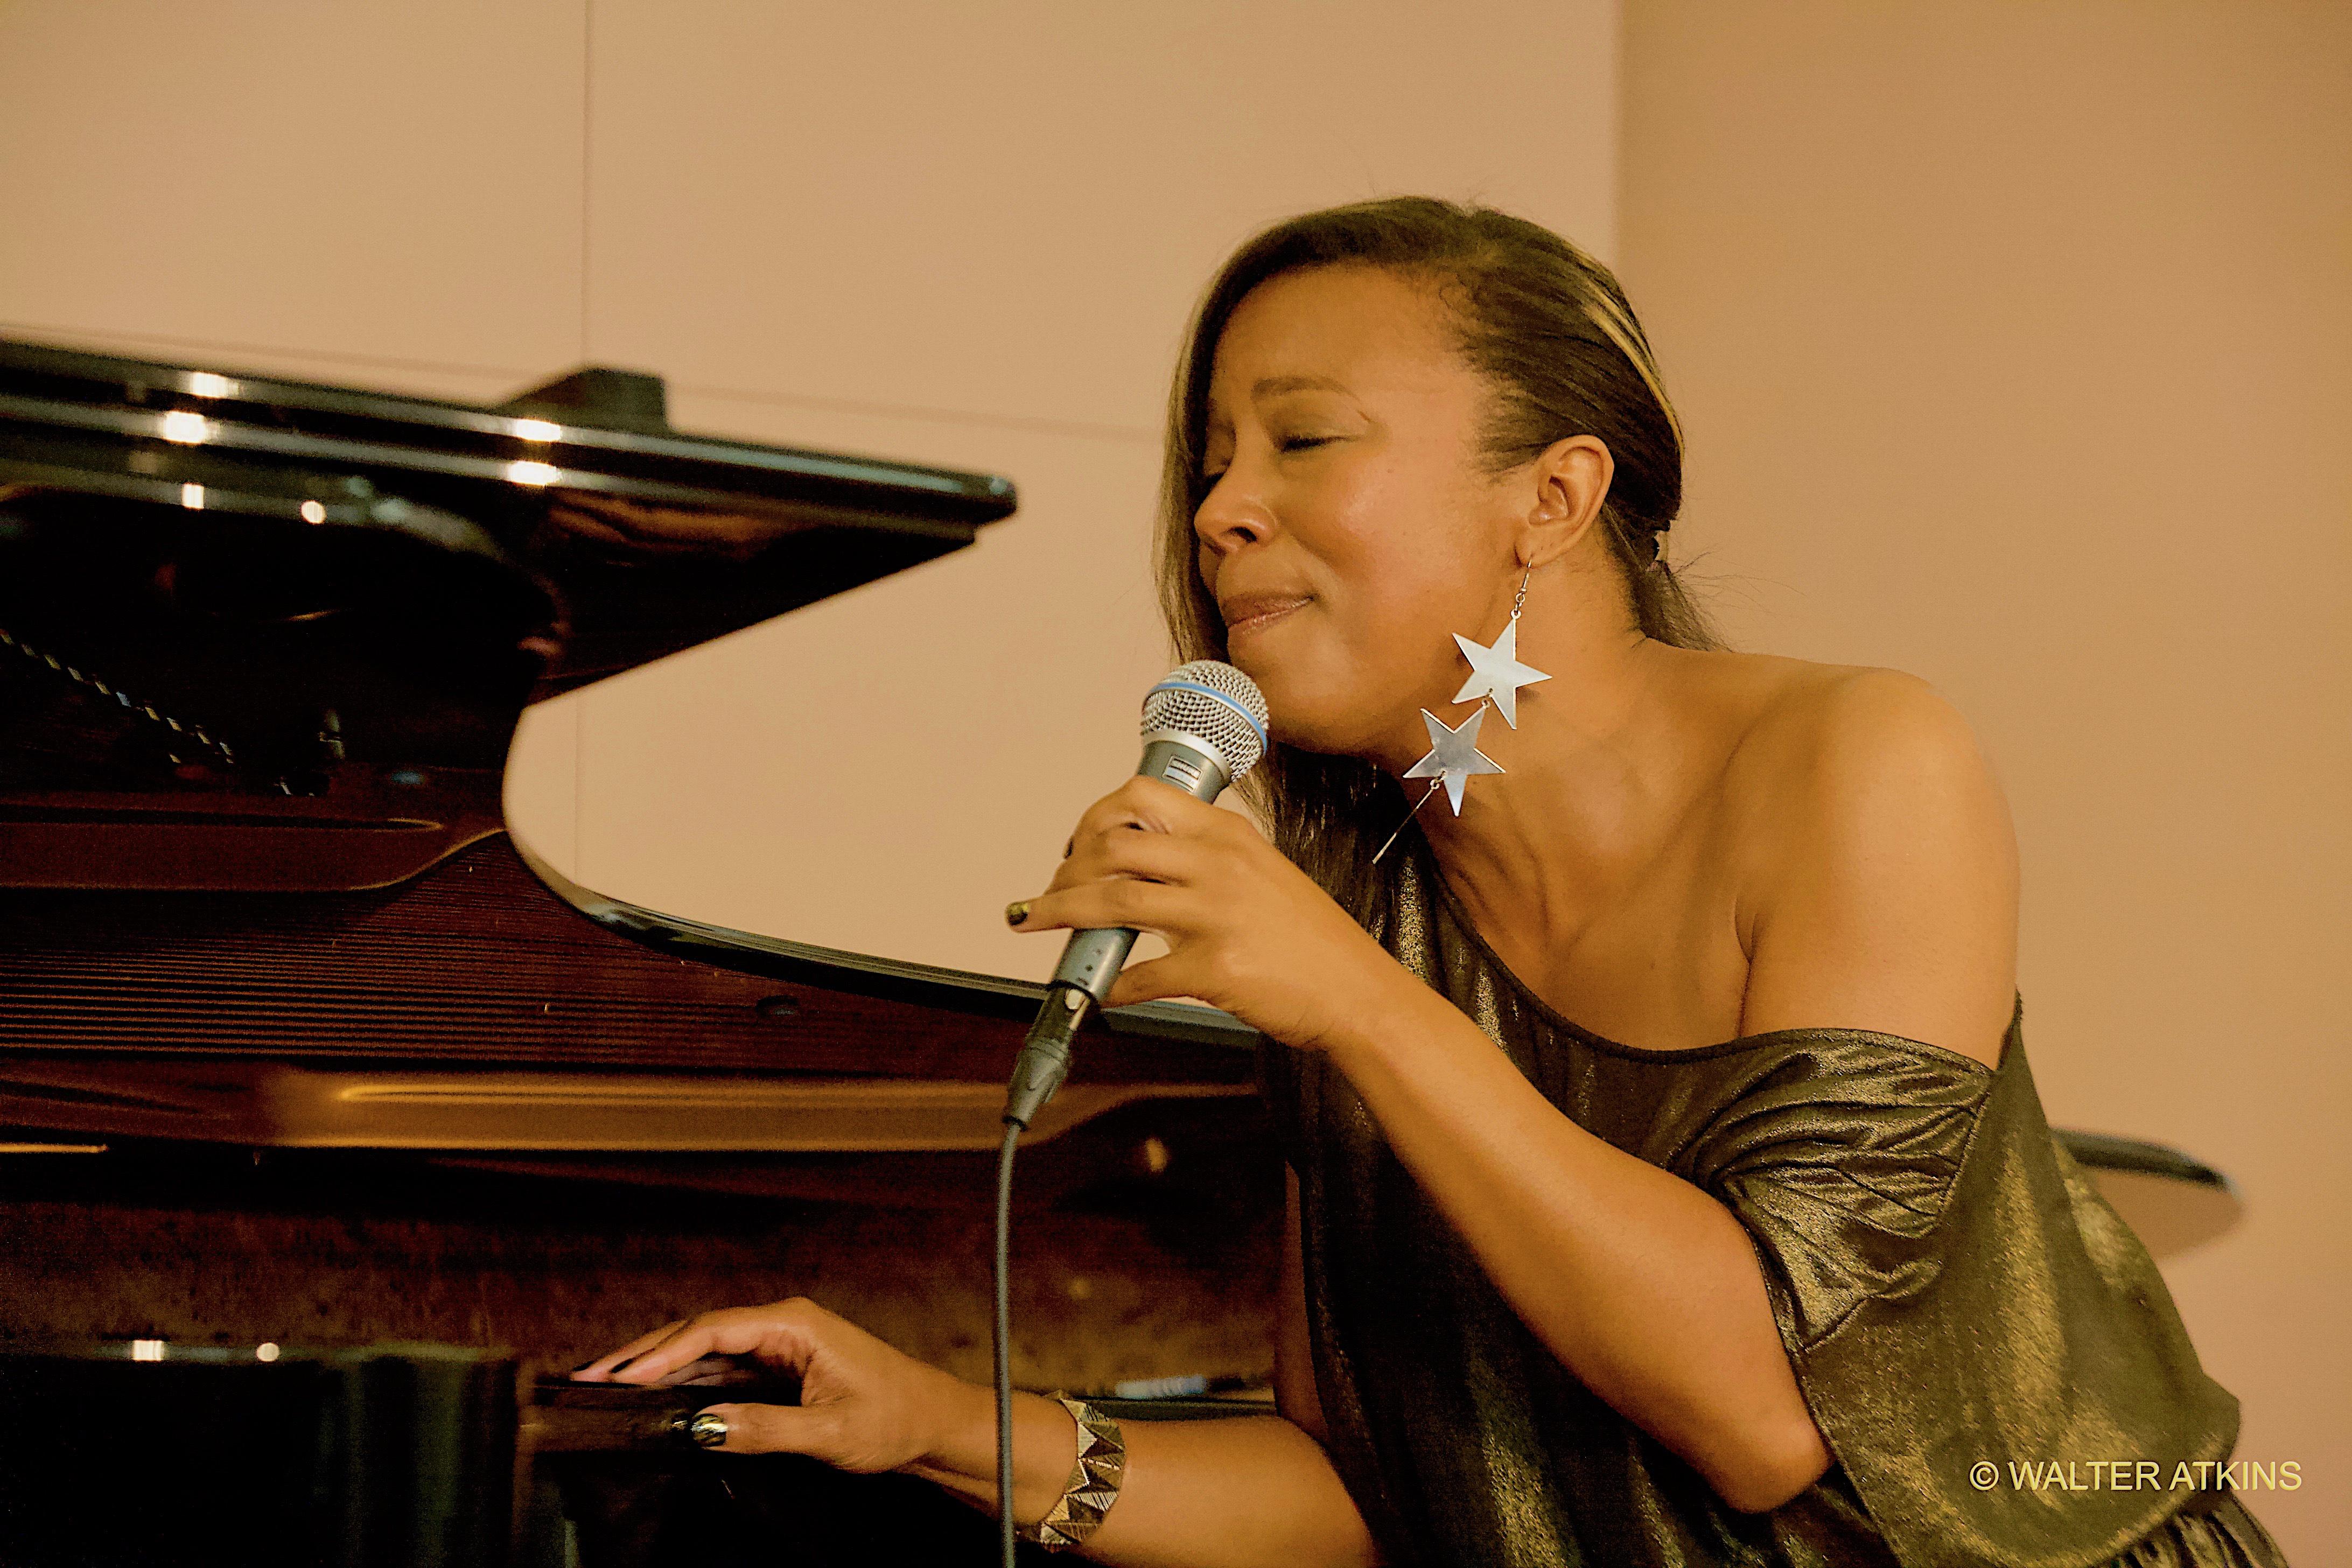 Tiffany Austin At Piedmont Piano Co. 2018